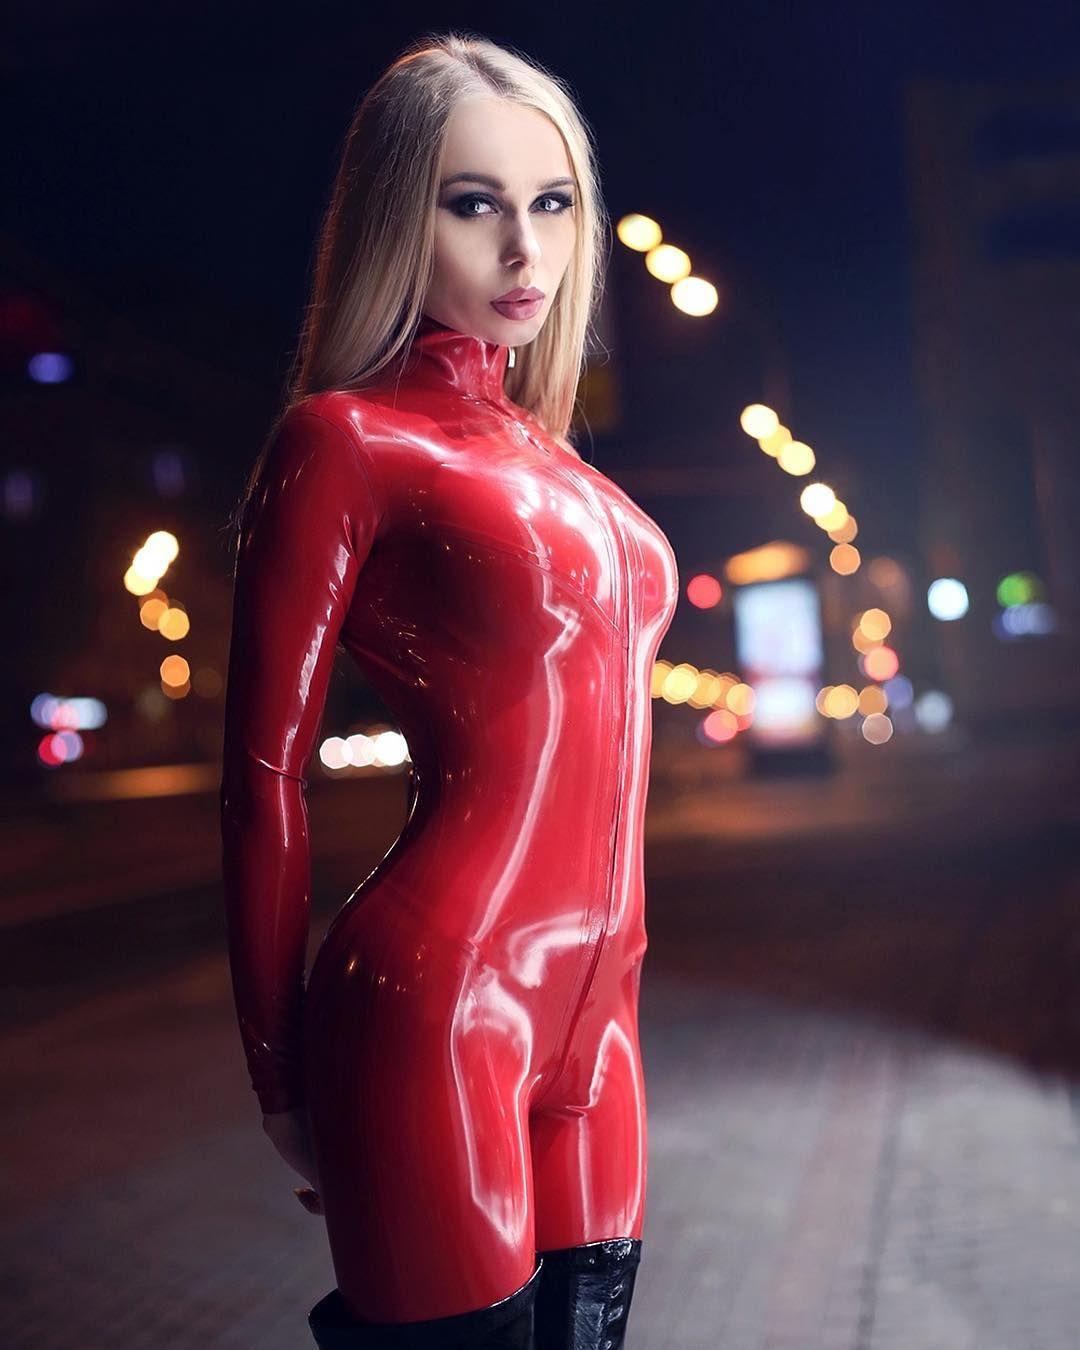 Younger woman sara redz